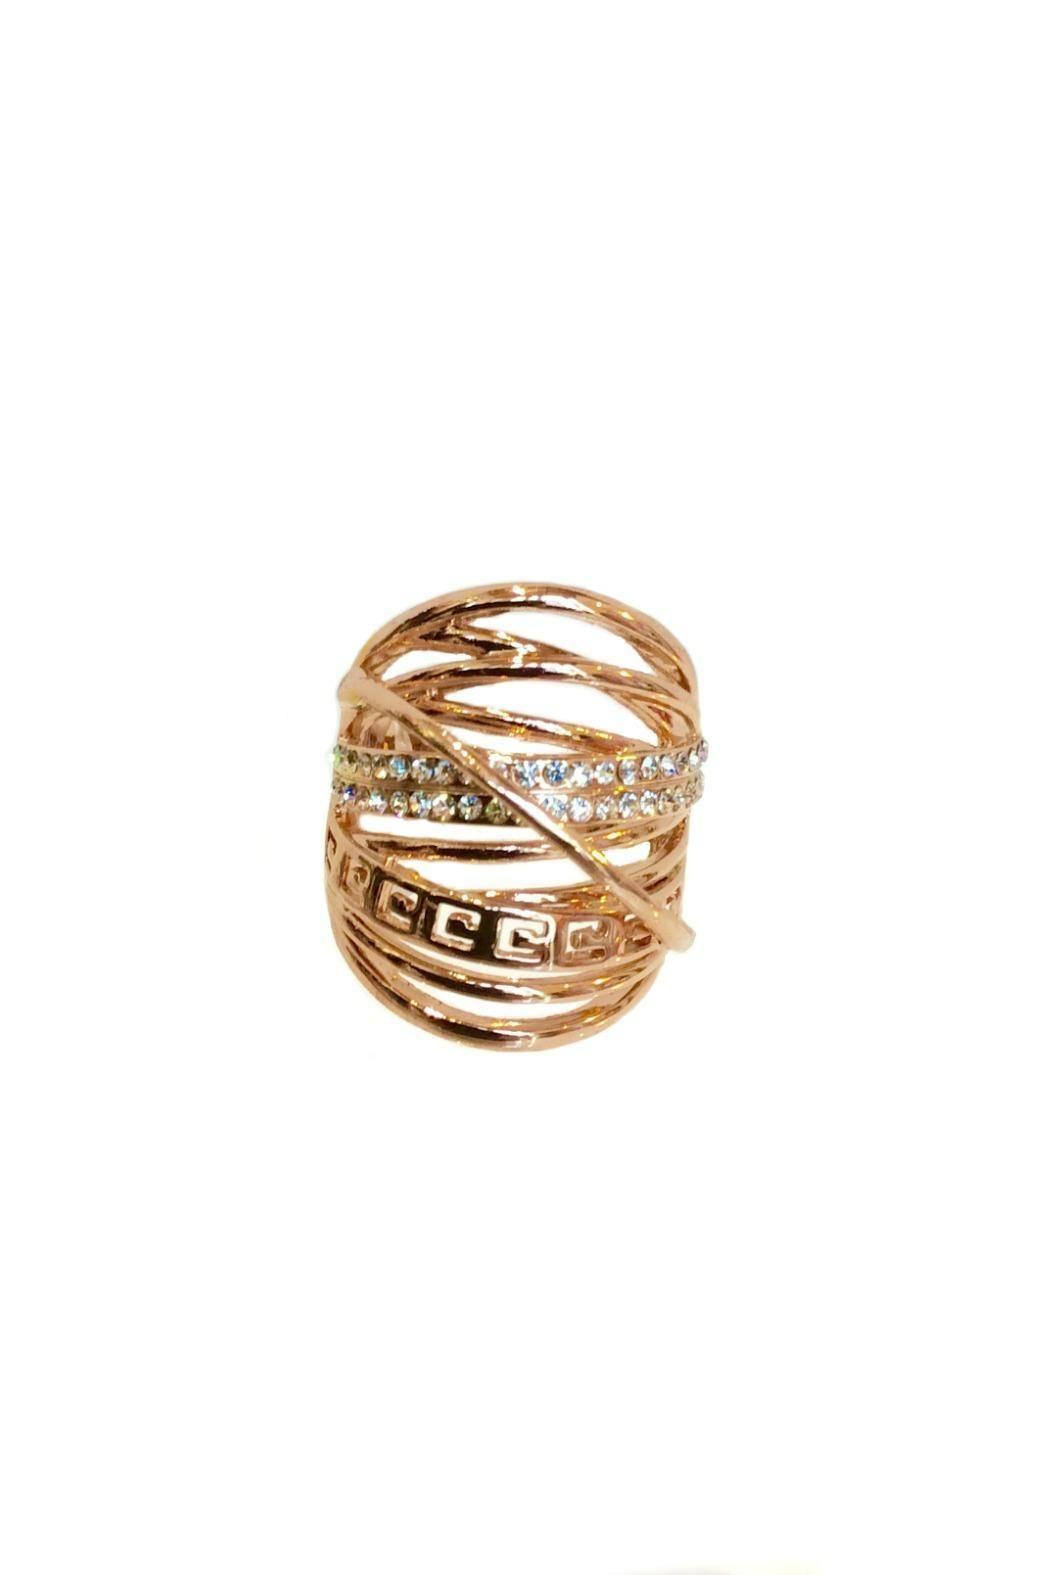 Luimagine greek key ring pinterest key rings key and stylish